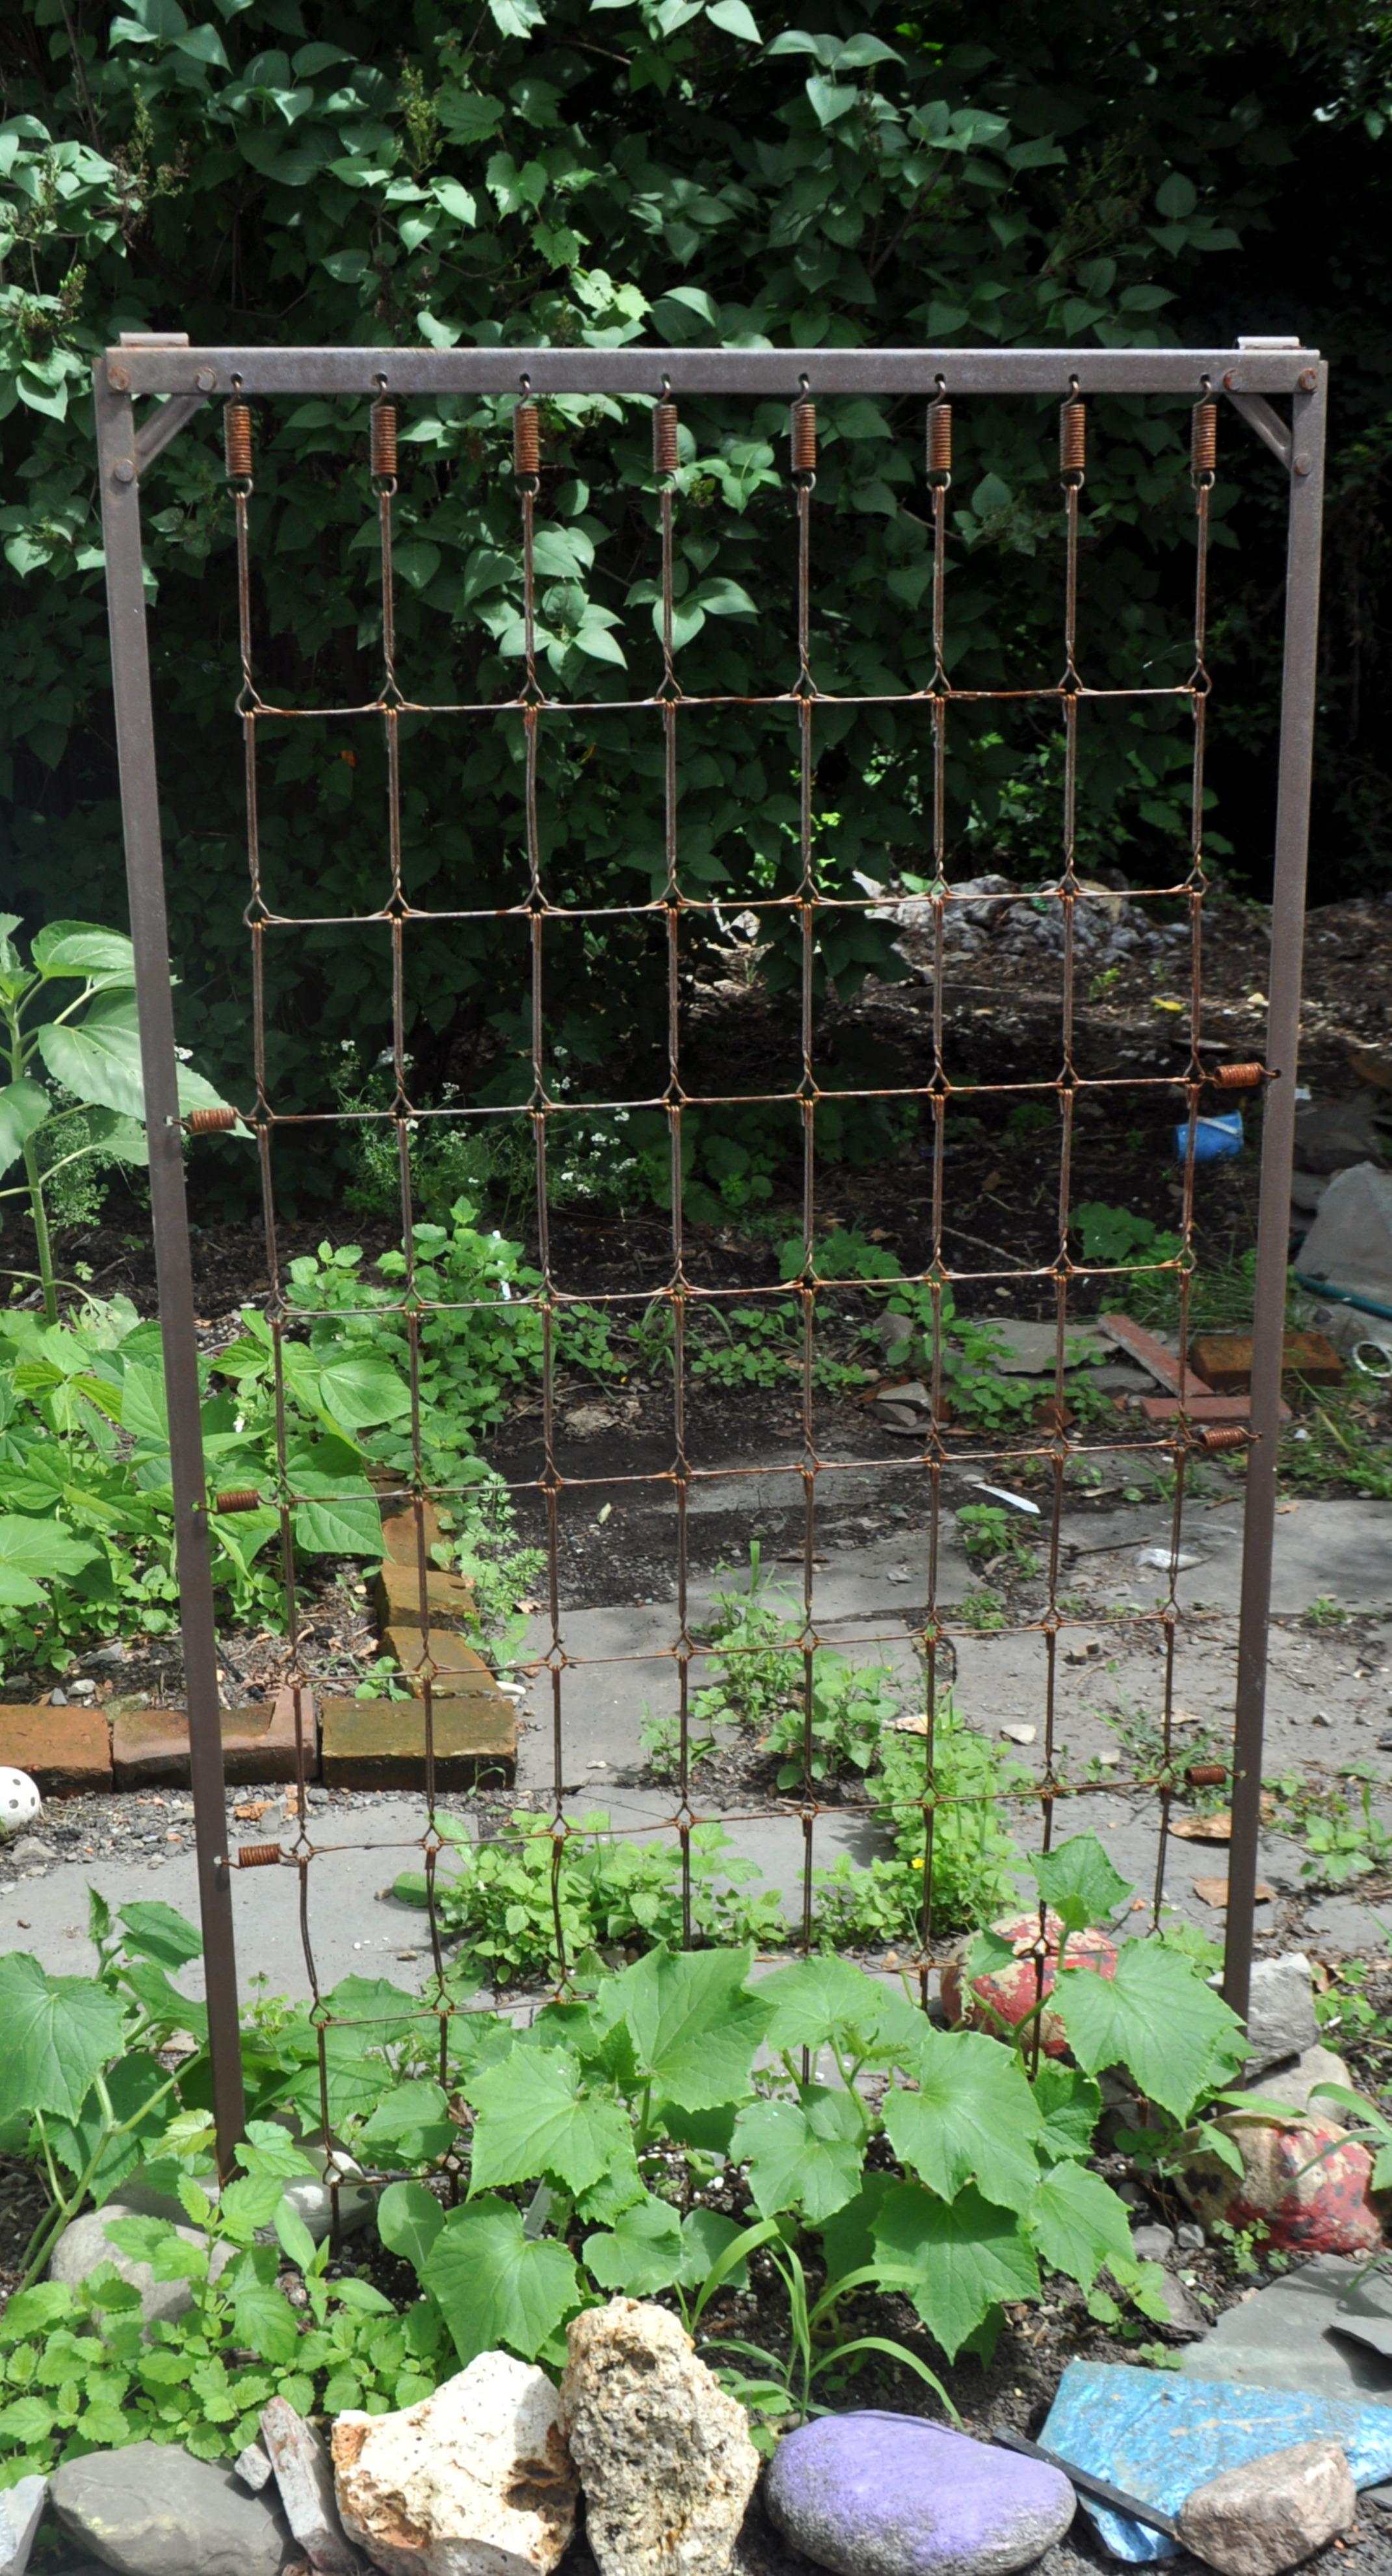 My Upcycled Cucumber Trellis Poor As Folk